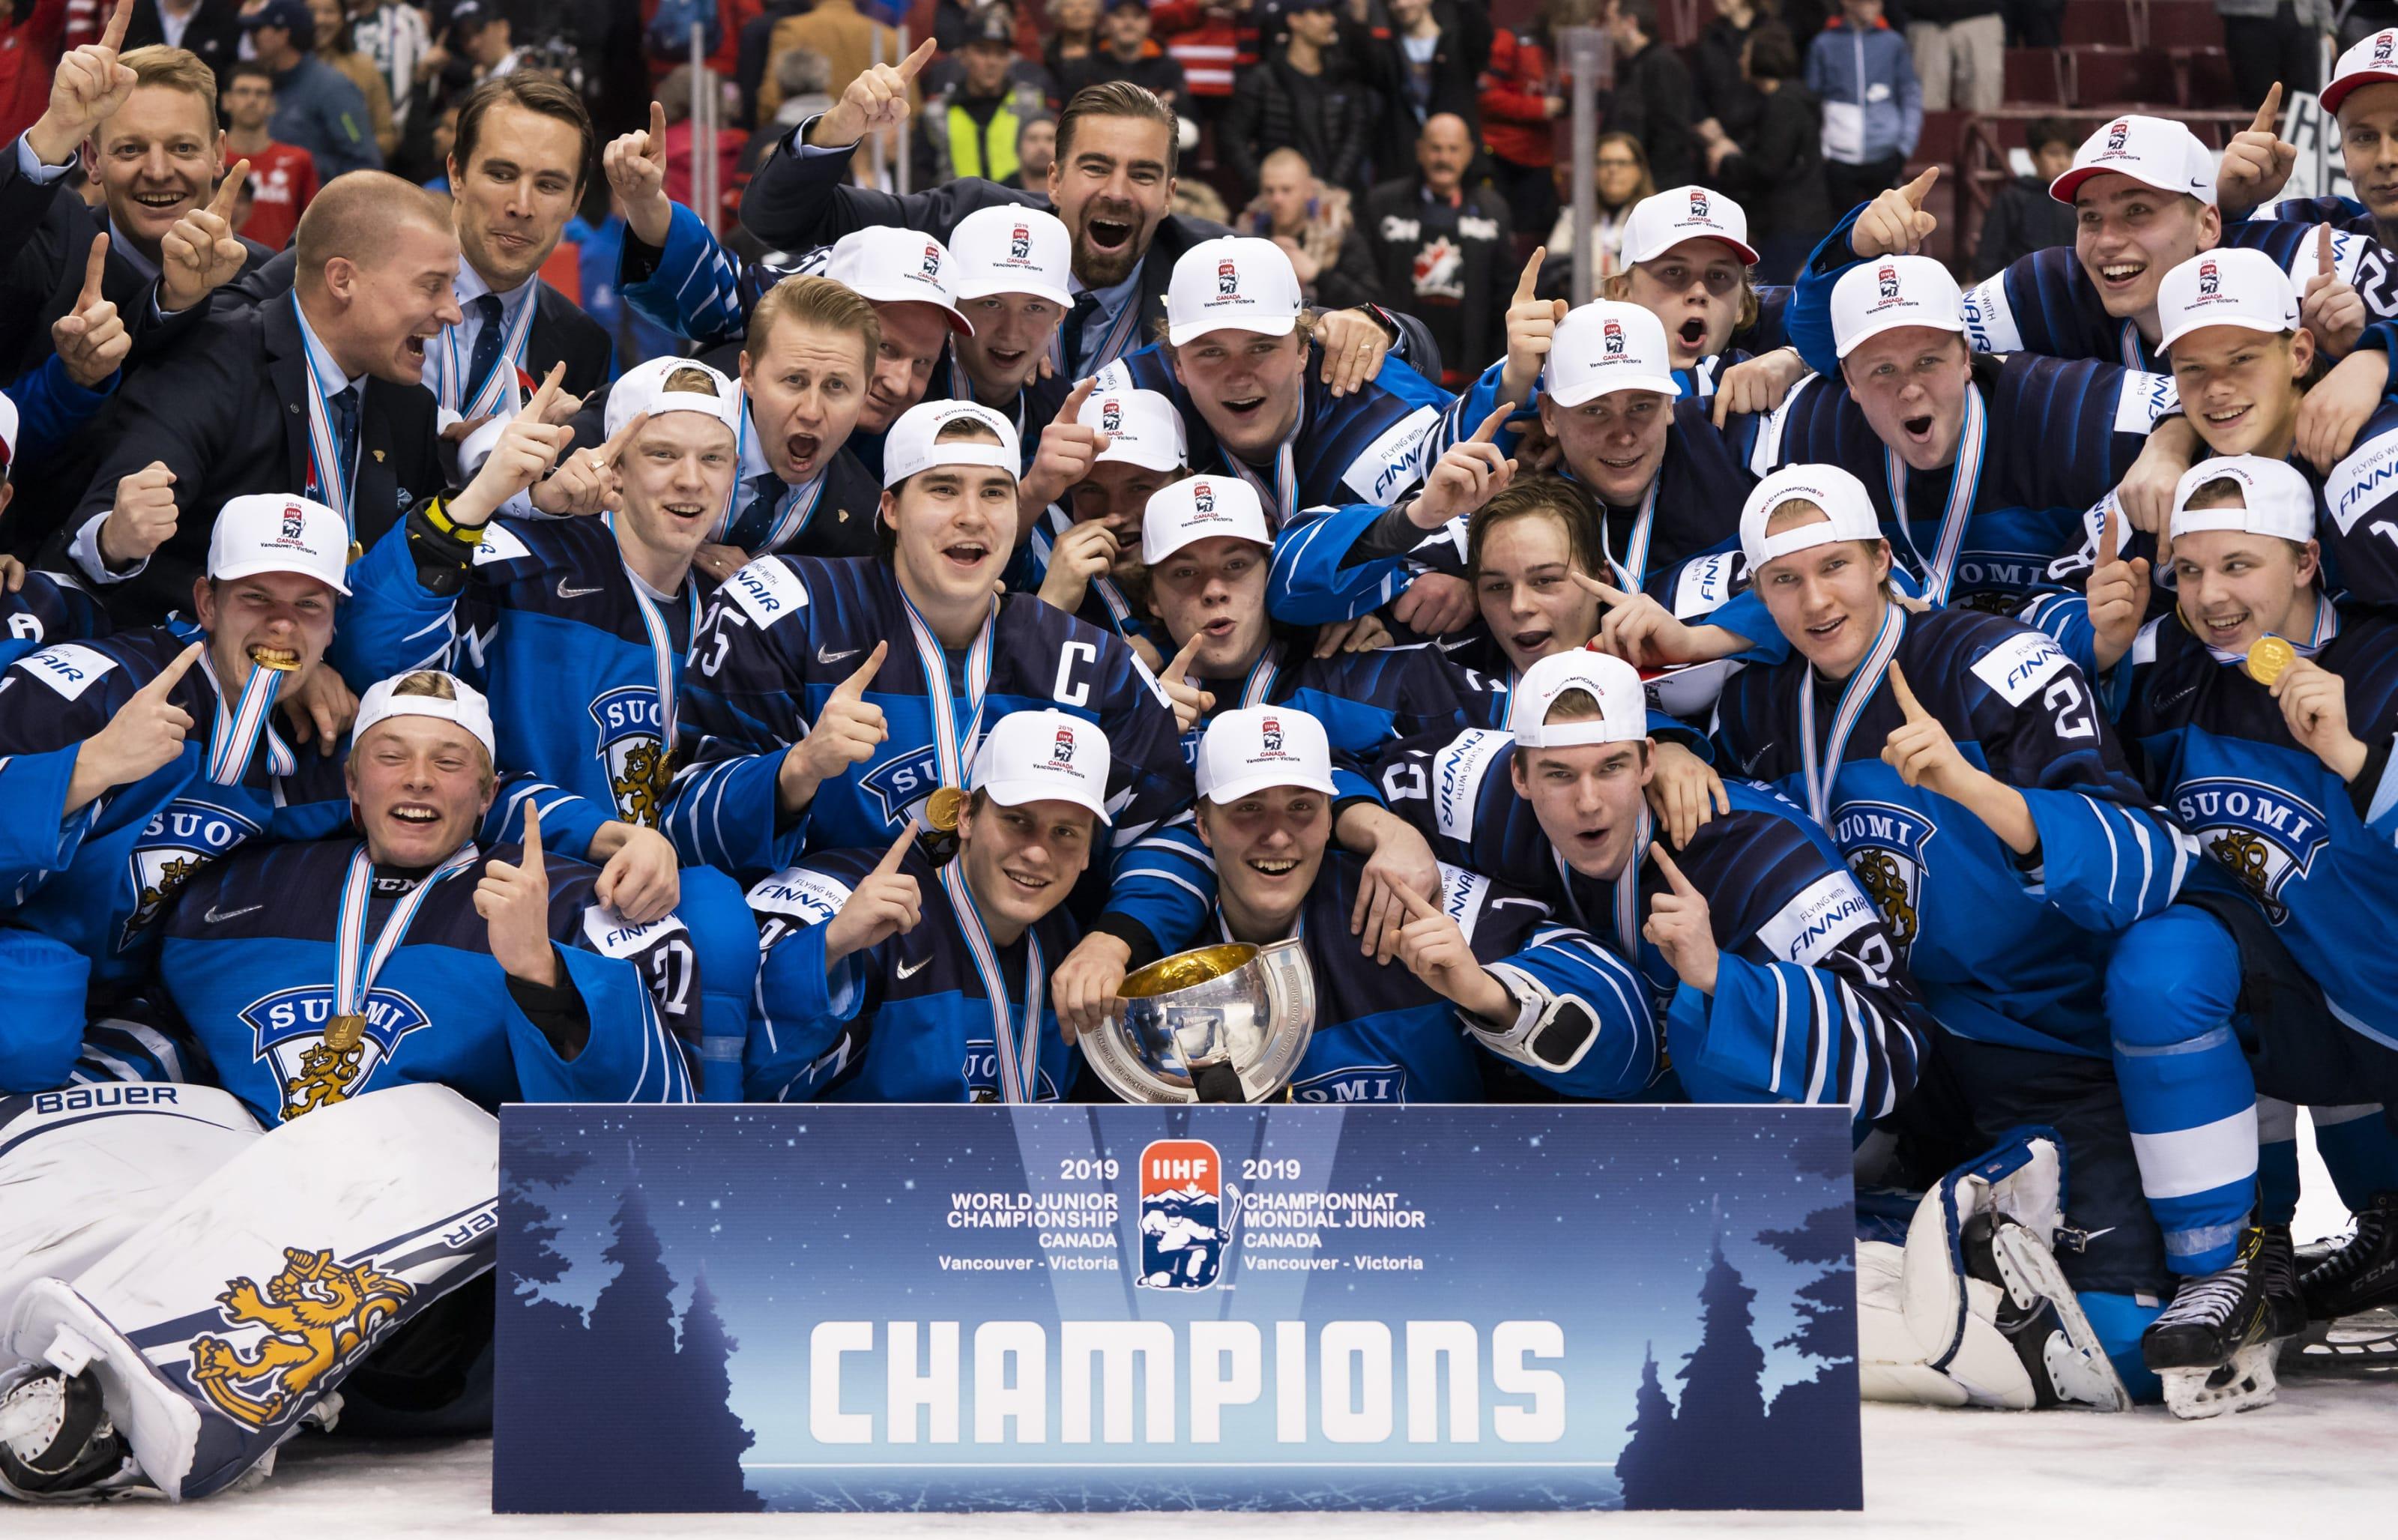 2019 world junior hockey championships